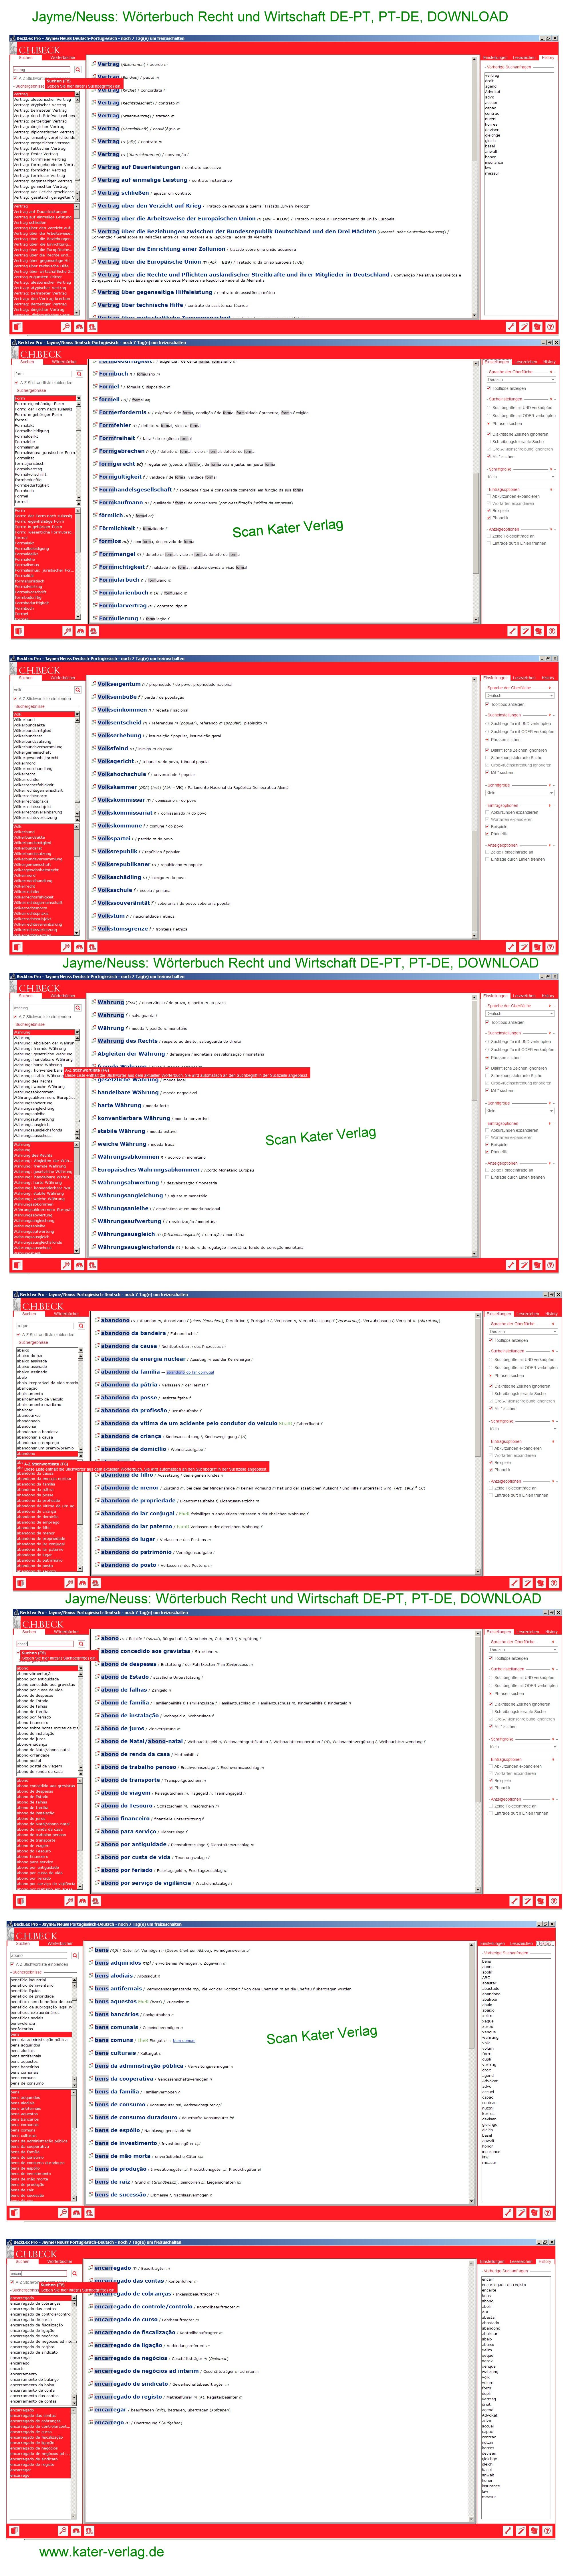 Jayme/Neuss: Wörterbuch Recht und Wirtschaft DE-PT, PT-DE, DOWNLOAD